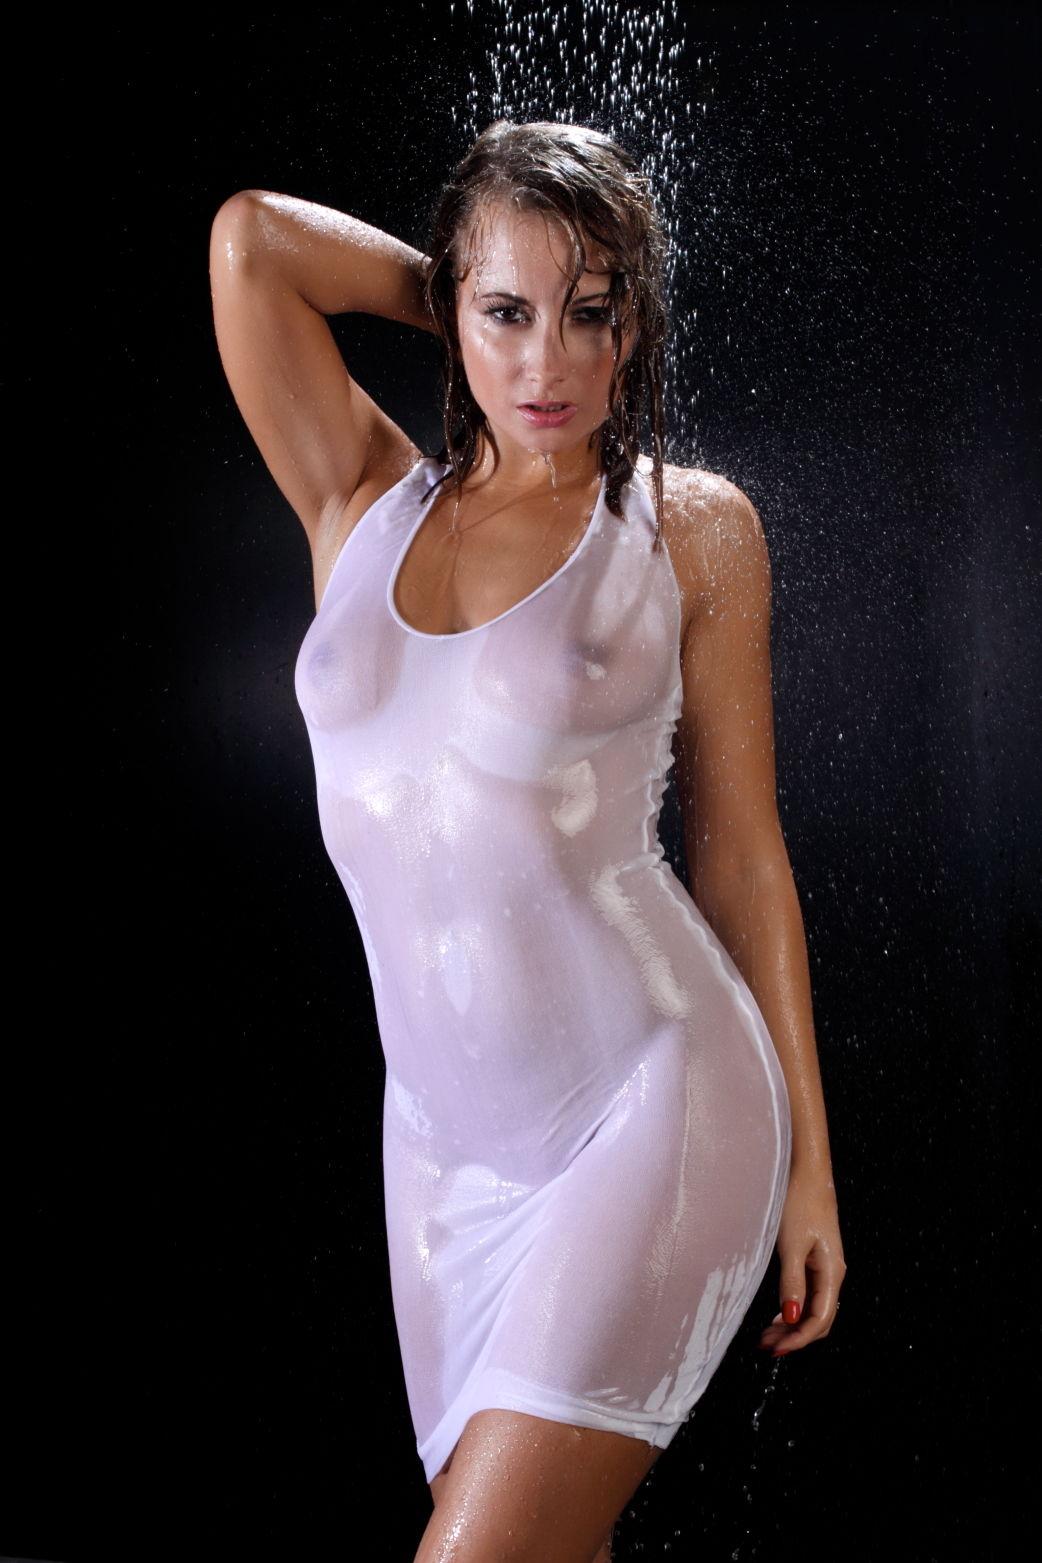 Kelli In The Shower